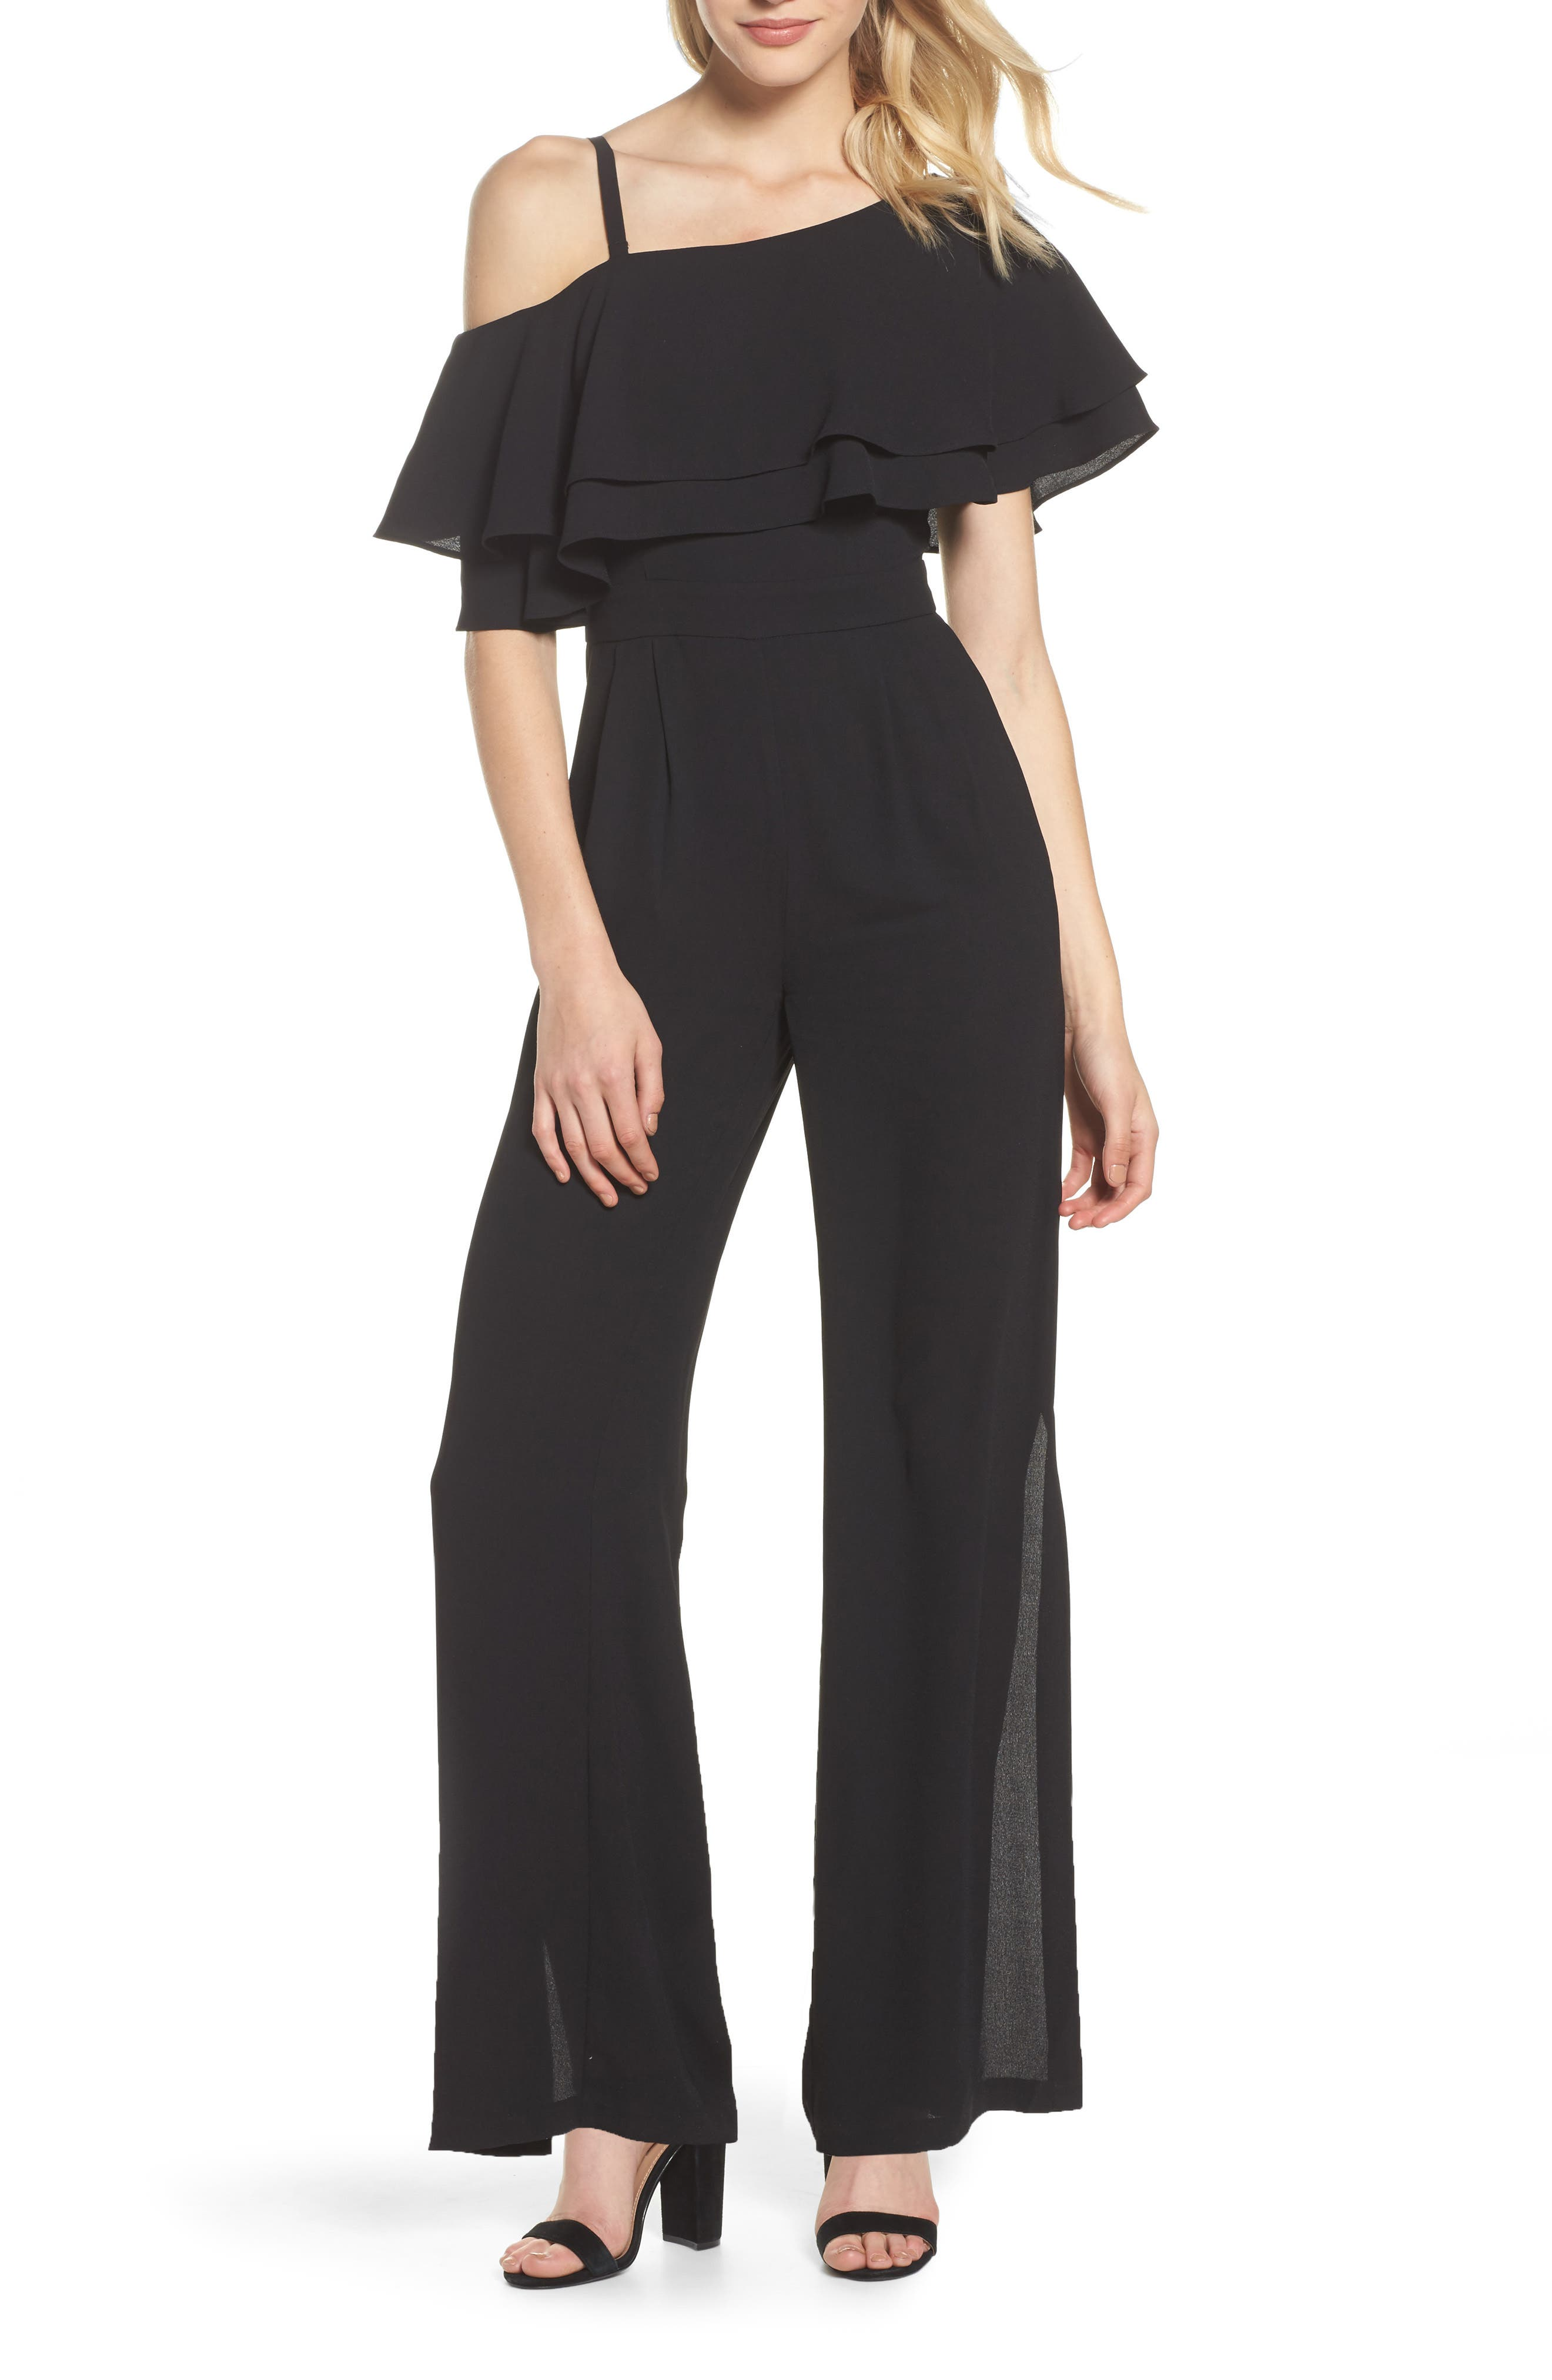 Moss One-Shoulder Jumpsuit,                         Main,                         color, Black